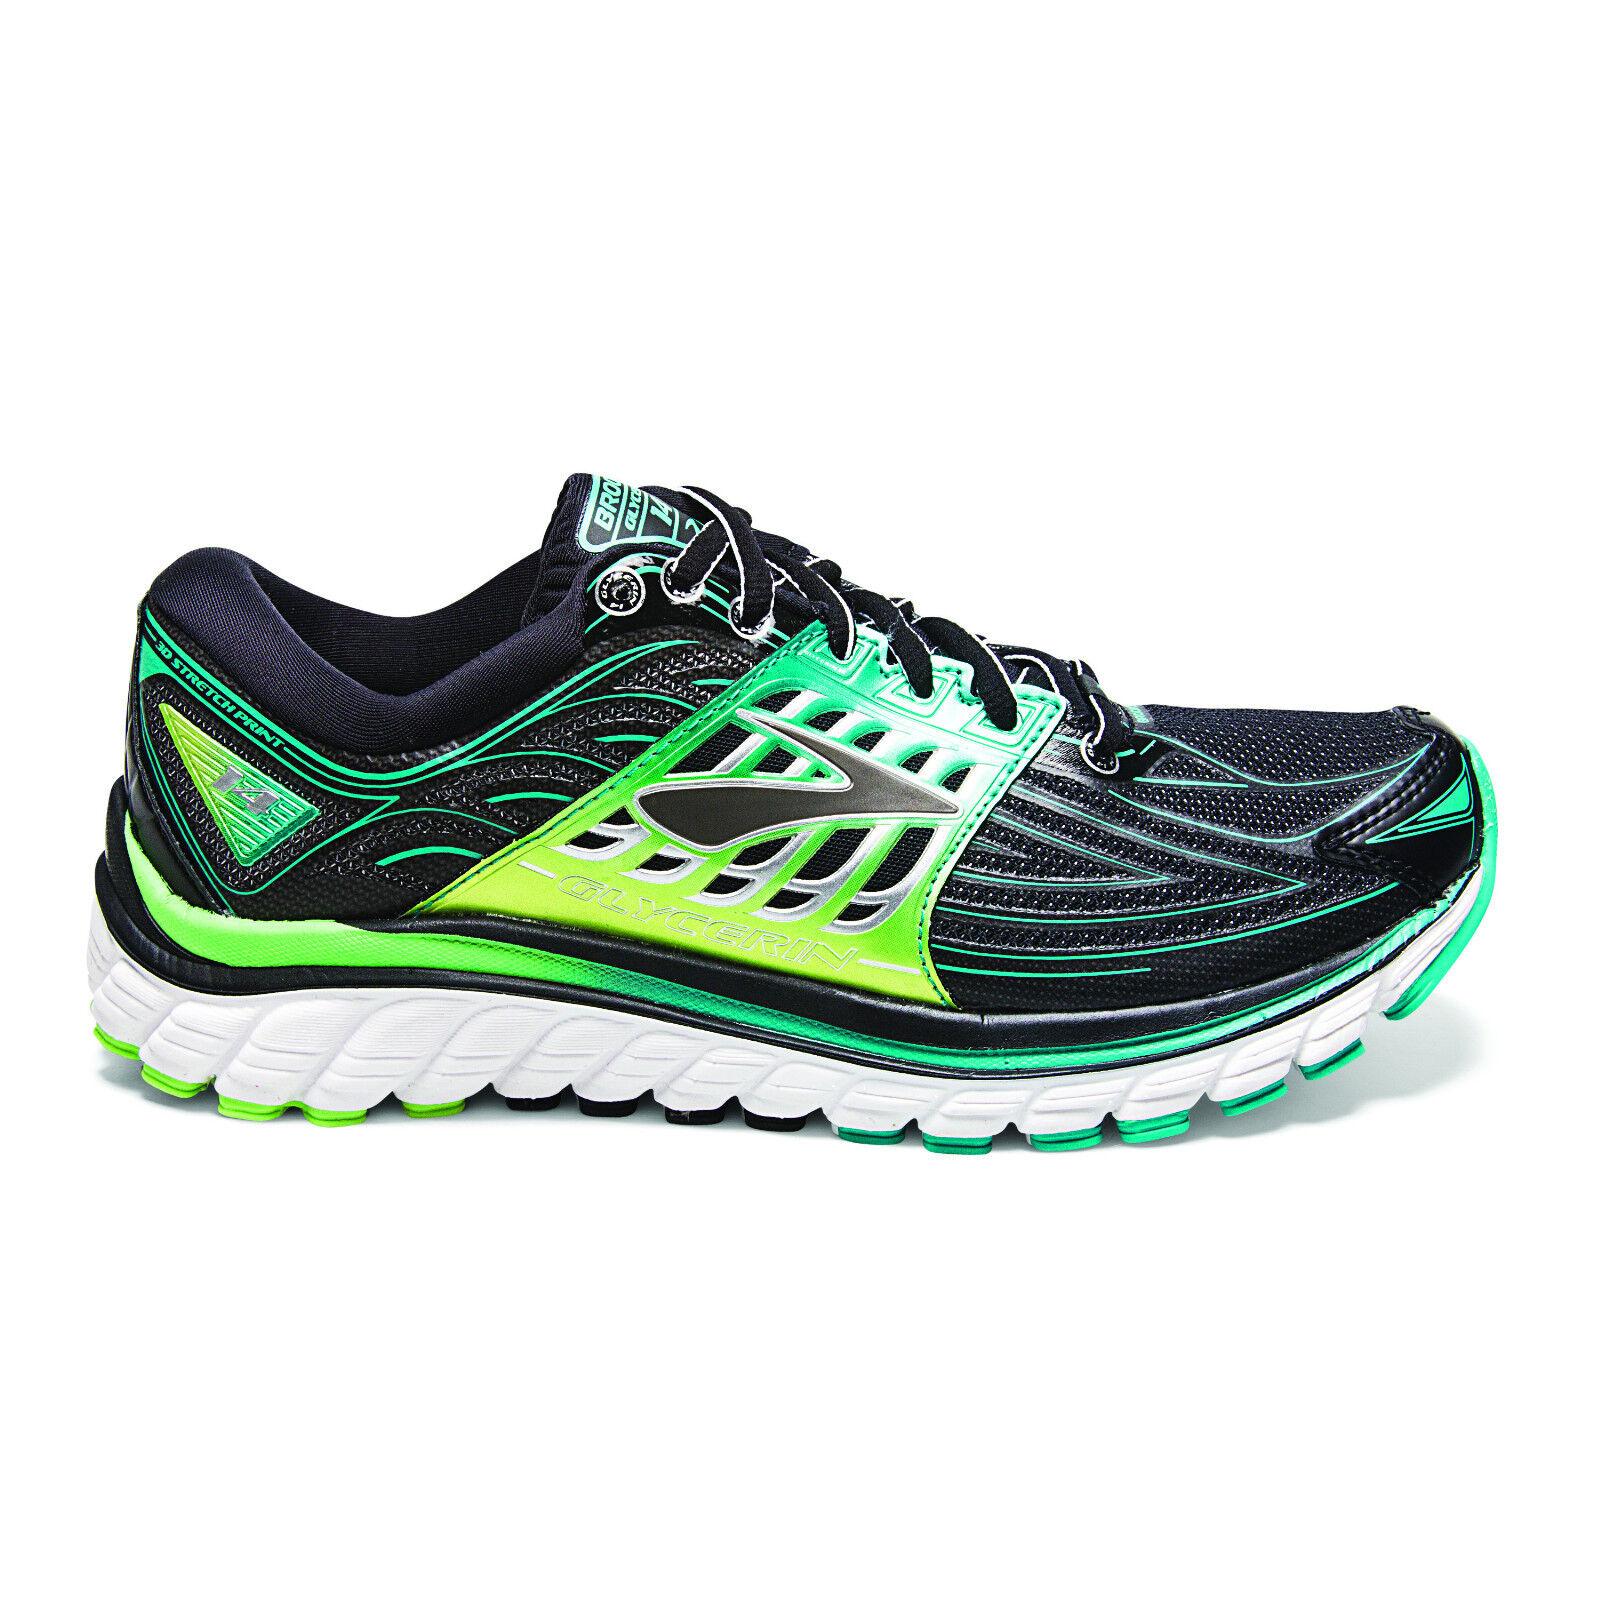 Bona Fide Brooks Glycerin 14 femmes Fit Running chaussures (B) (064)